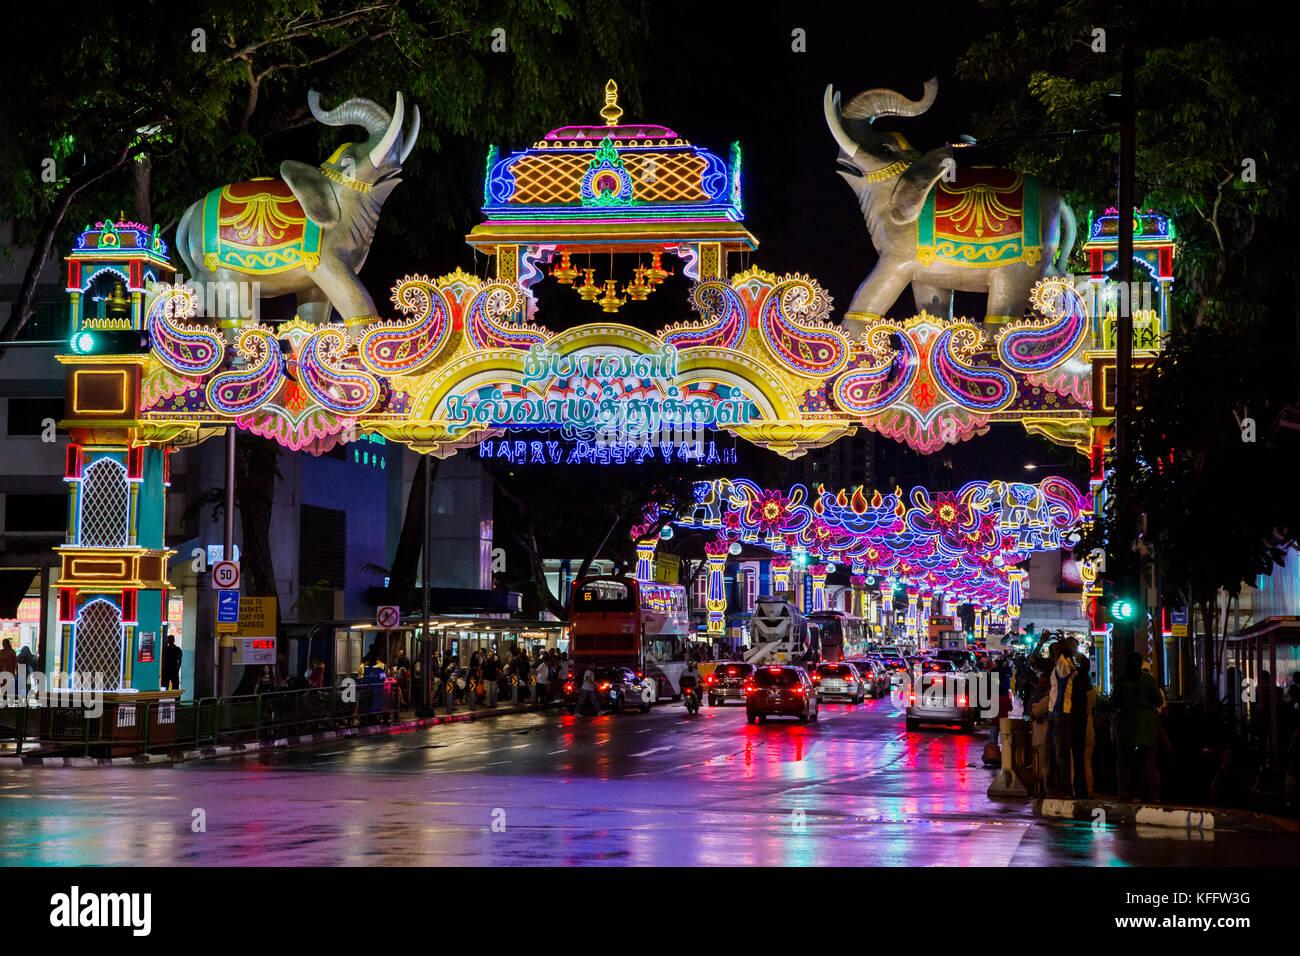 Deepavali Festival Singapore Stock Photos  for Deepavali 2017 Celebration  585eri